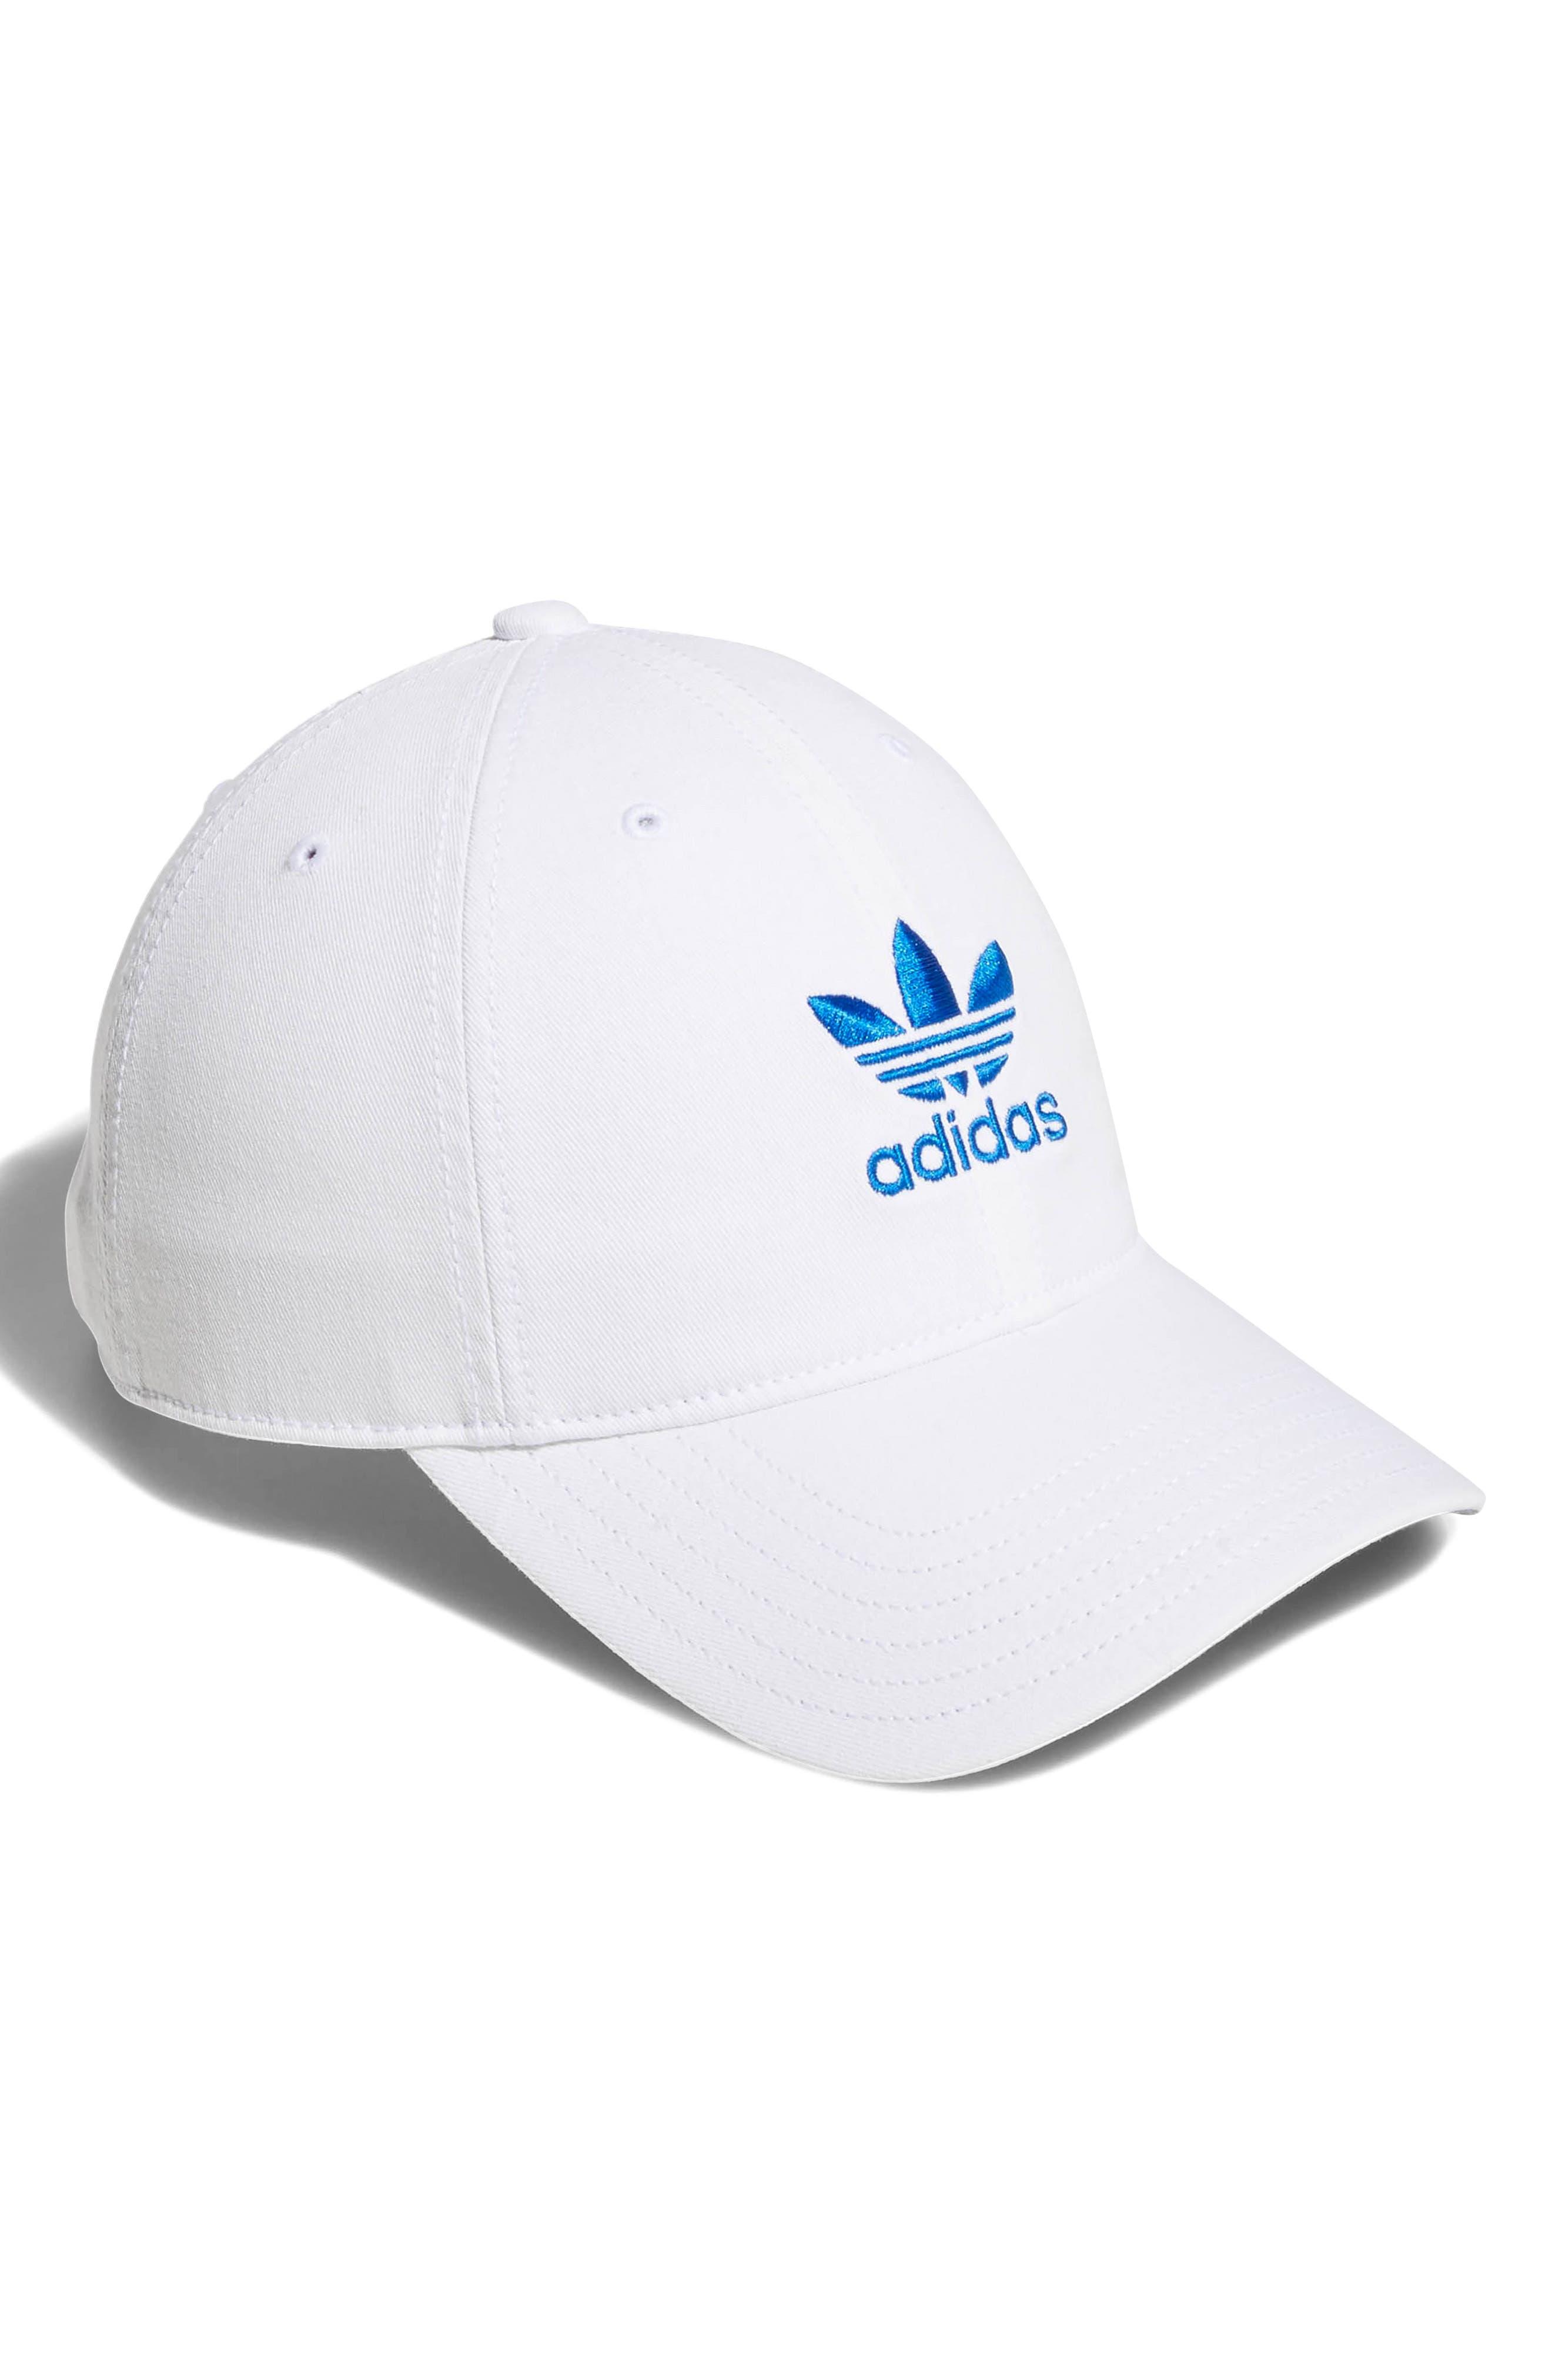 Originals Relaxed Strap-Back Cap,                         Main,                         color, White/ Bluebird